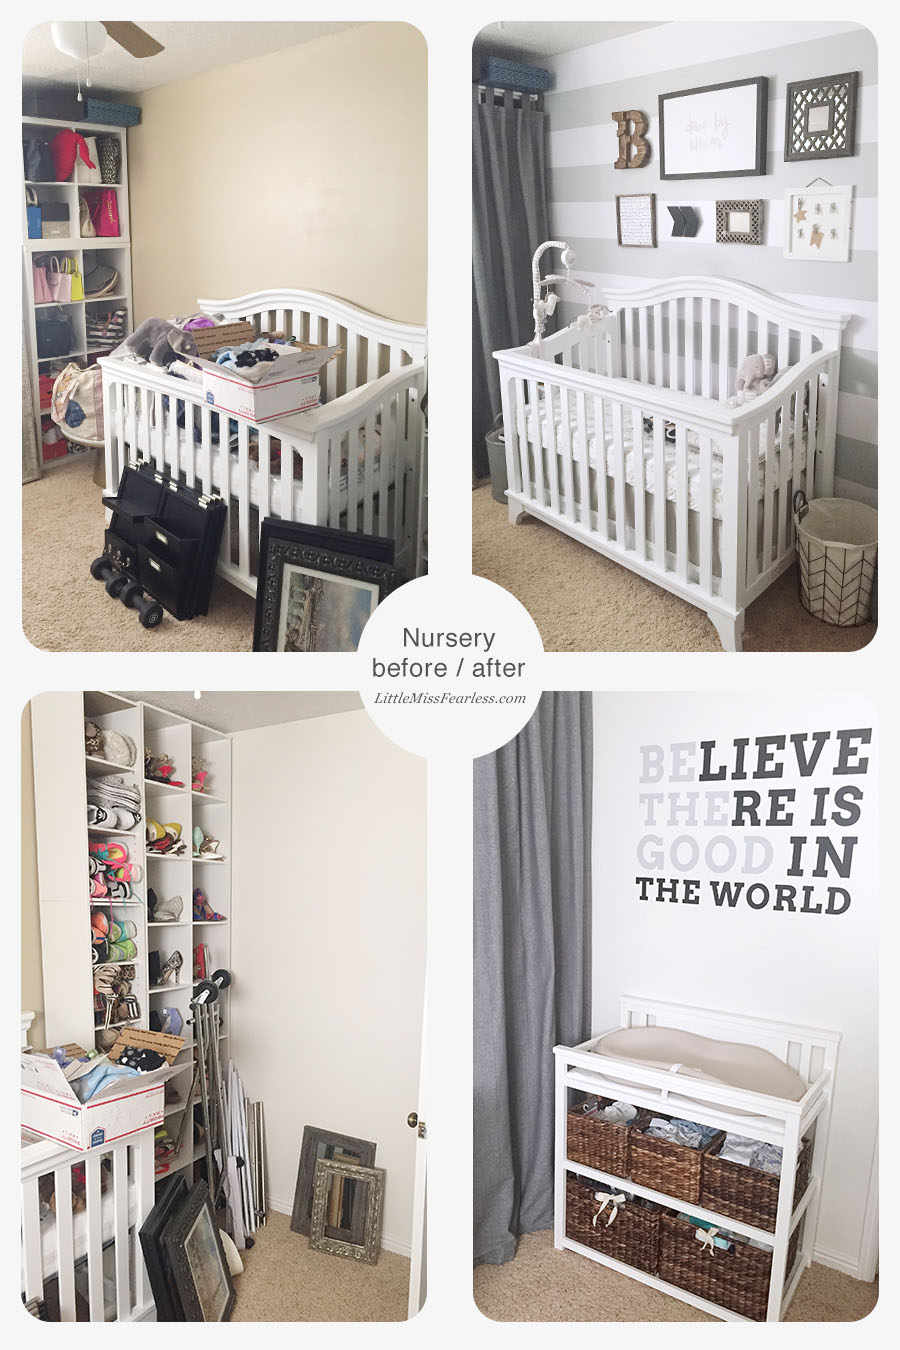 LittleMissFearless_baby-nursery-before-after-1